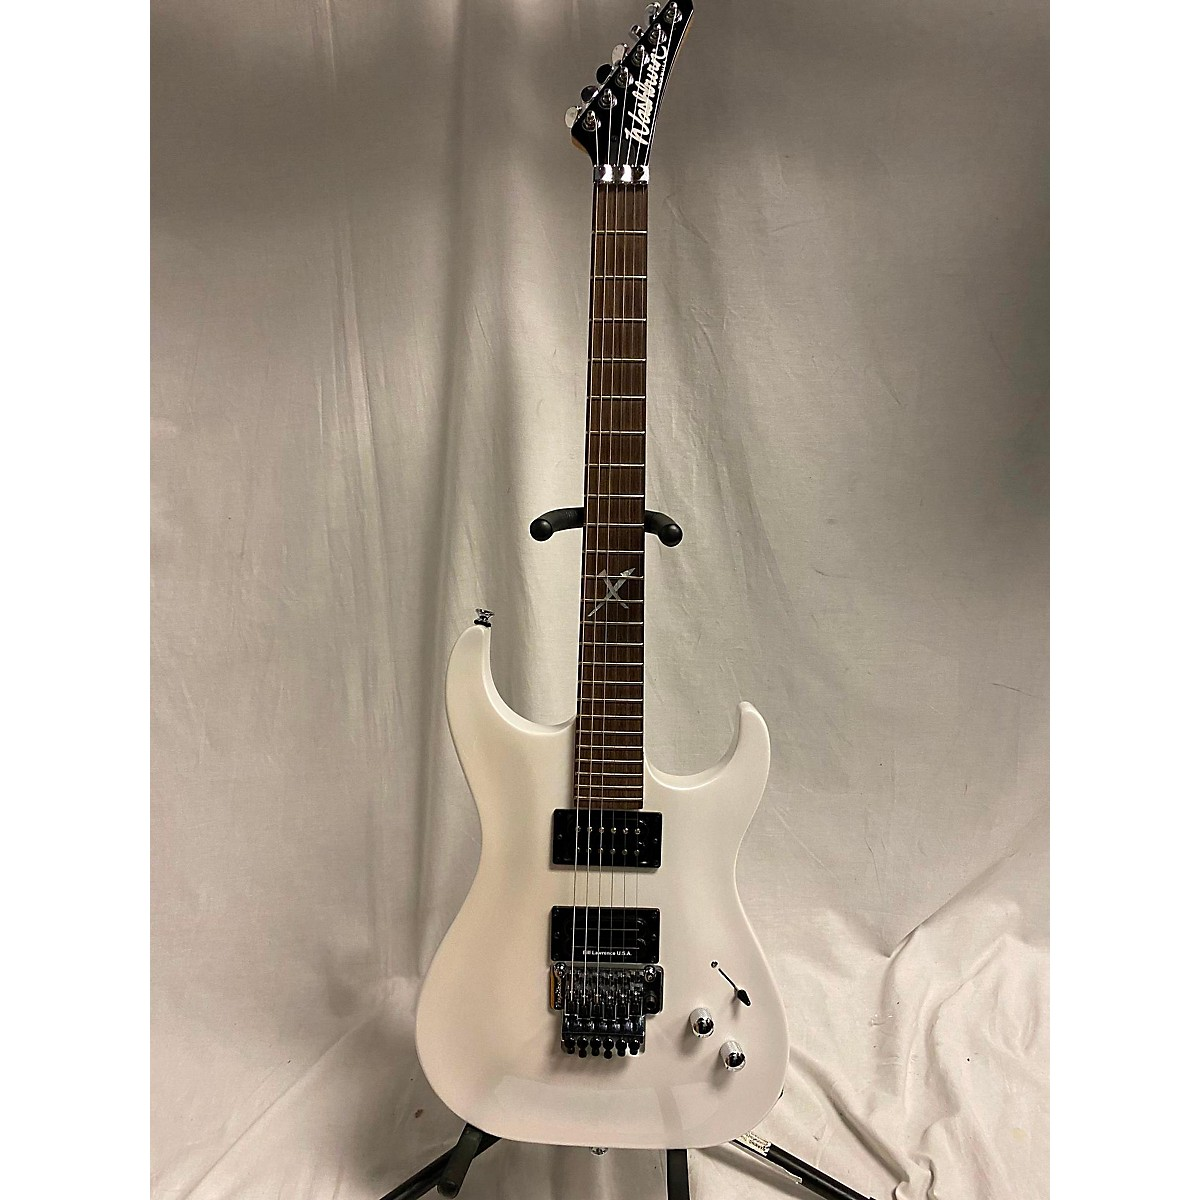 Washburn X500-v Solid Body Electric Guitar